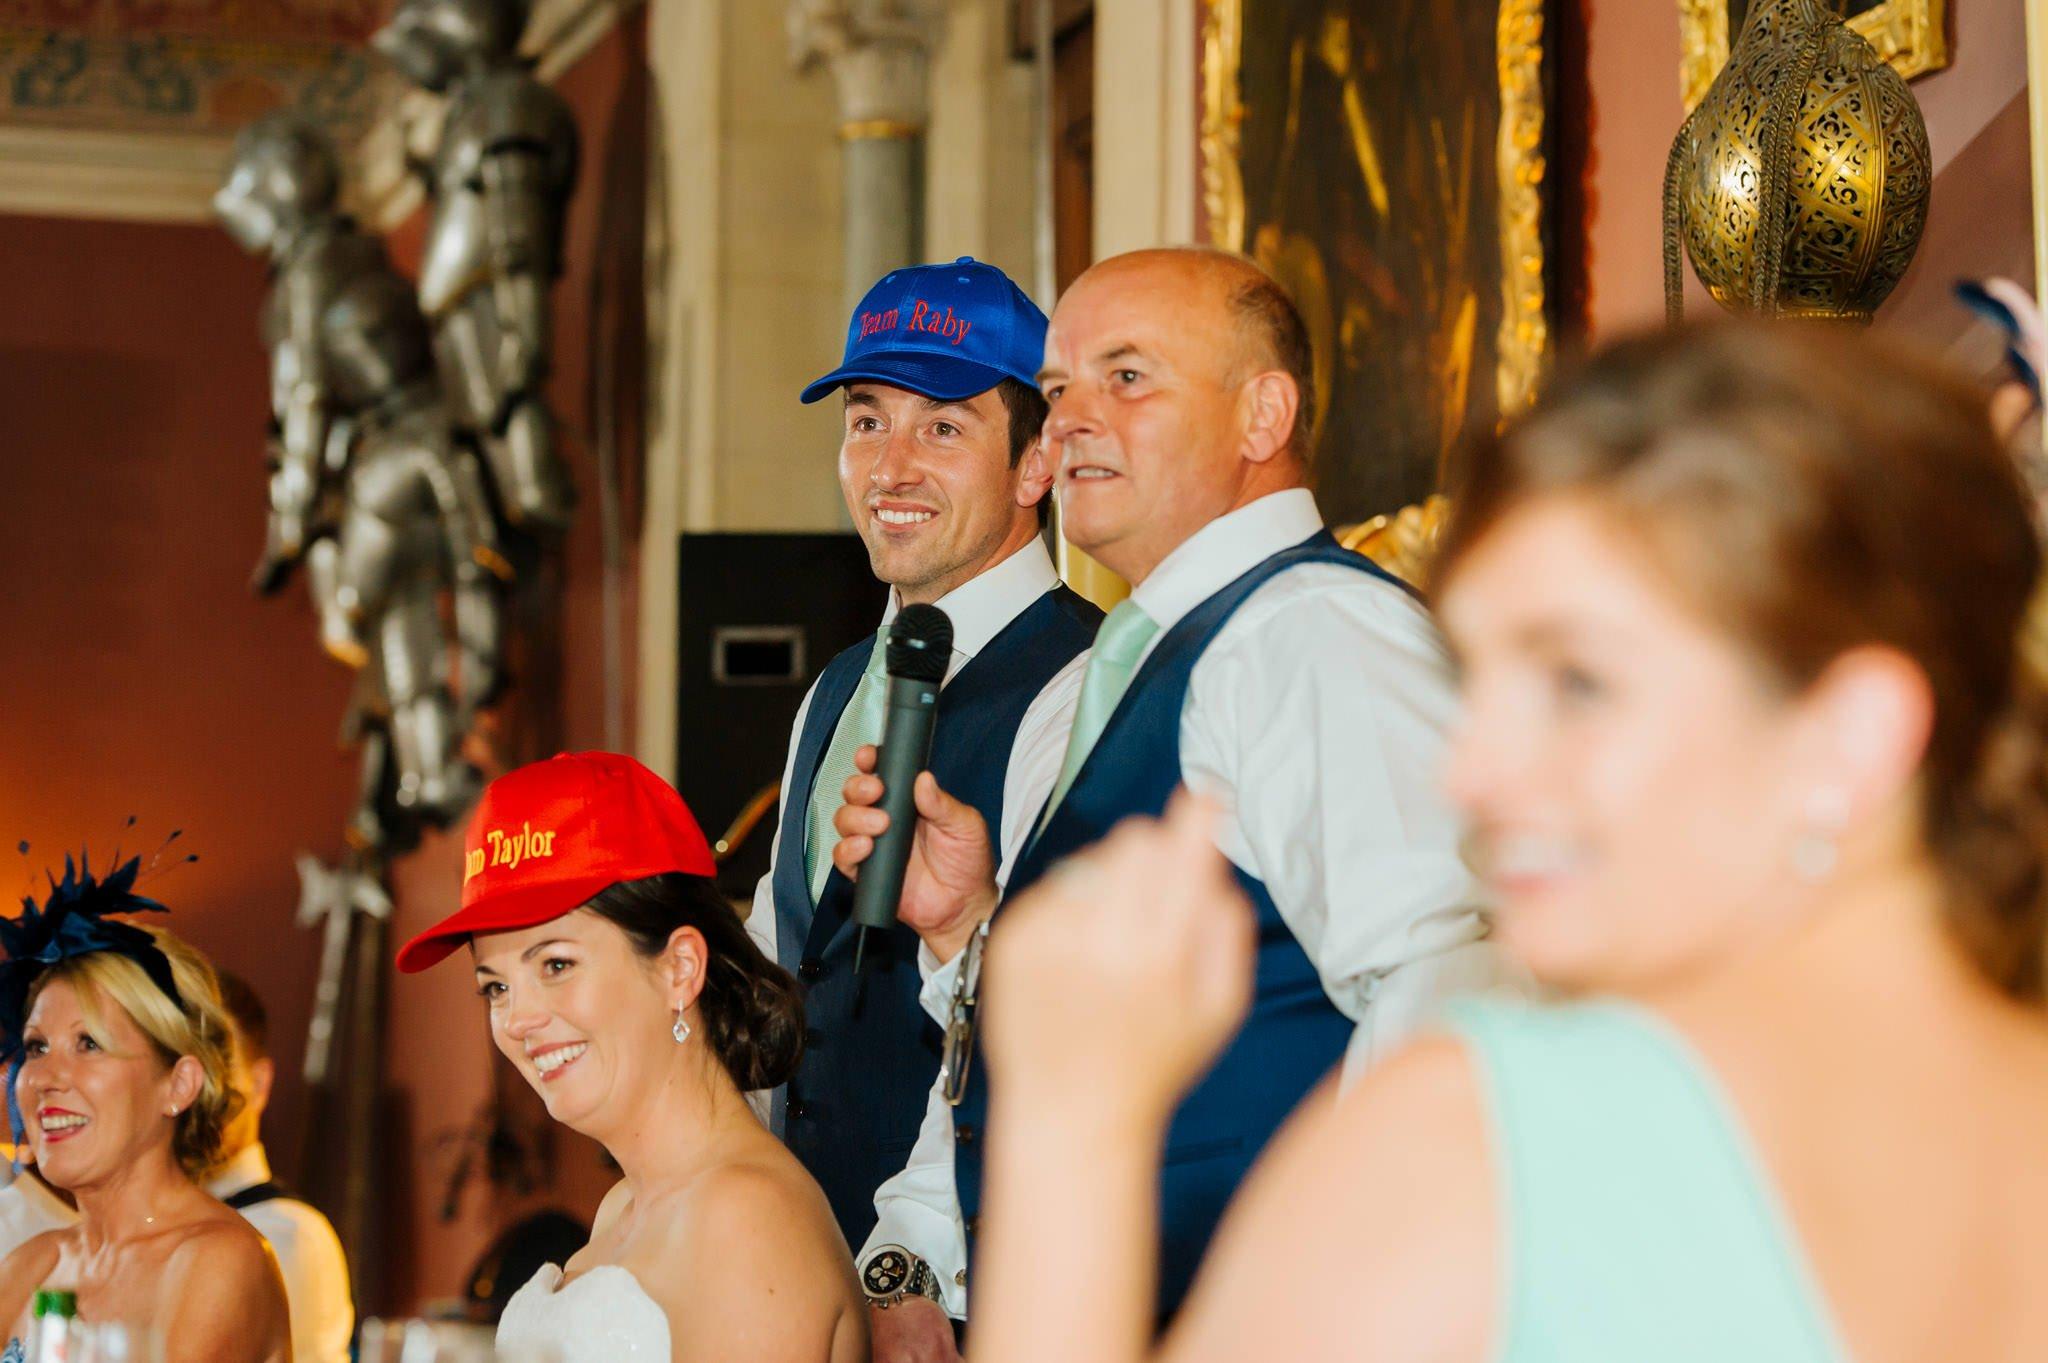 Eastnor Castle wedding photographer Herefordshire, West Midlands - Sarah + Dean 52